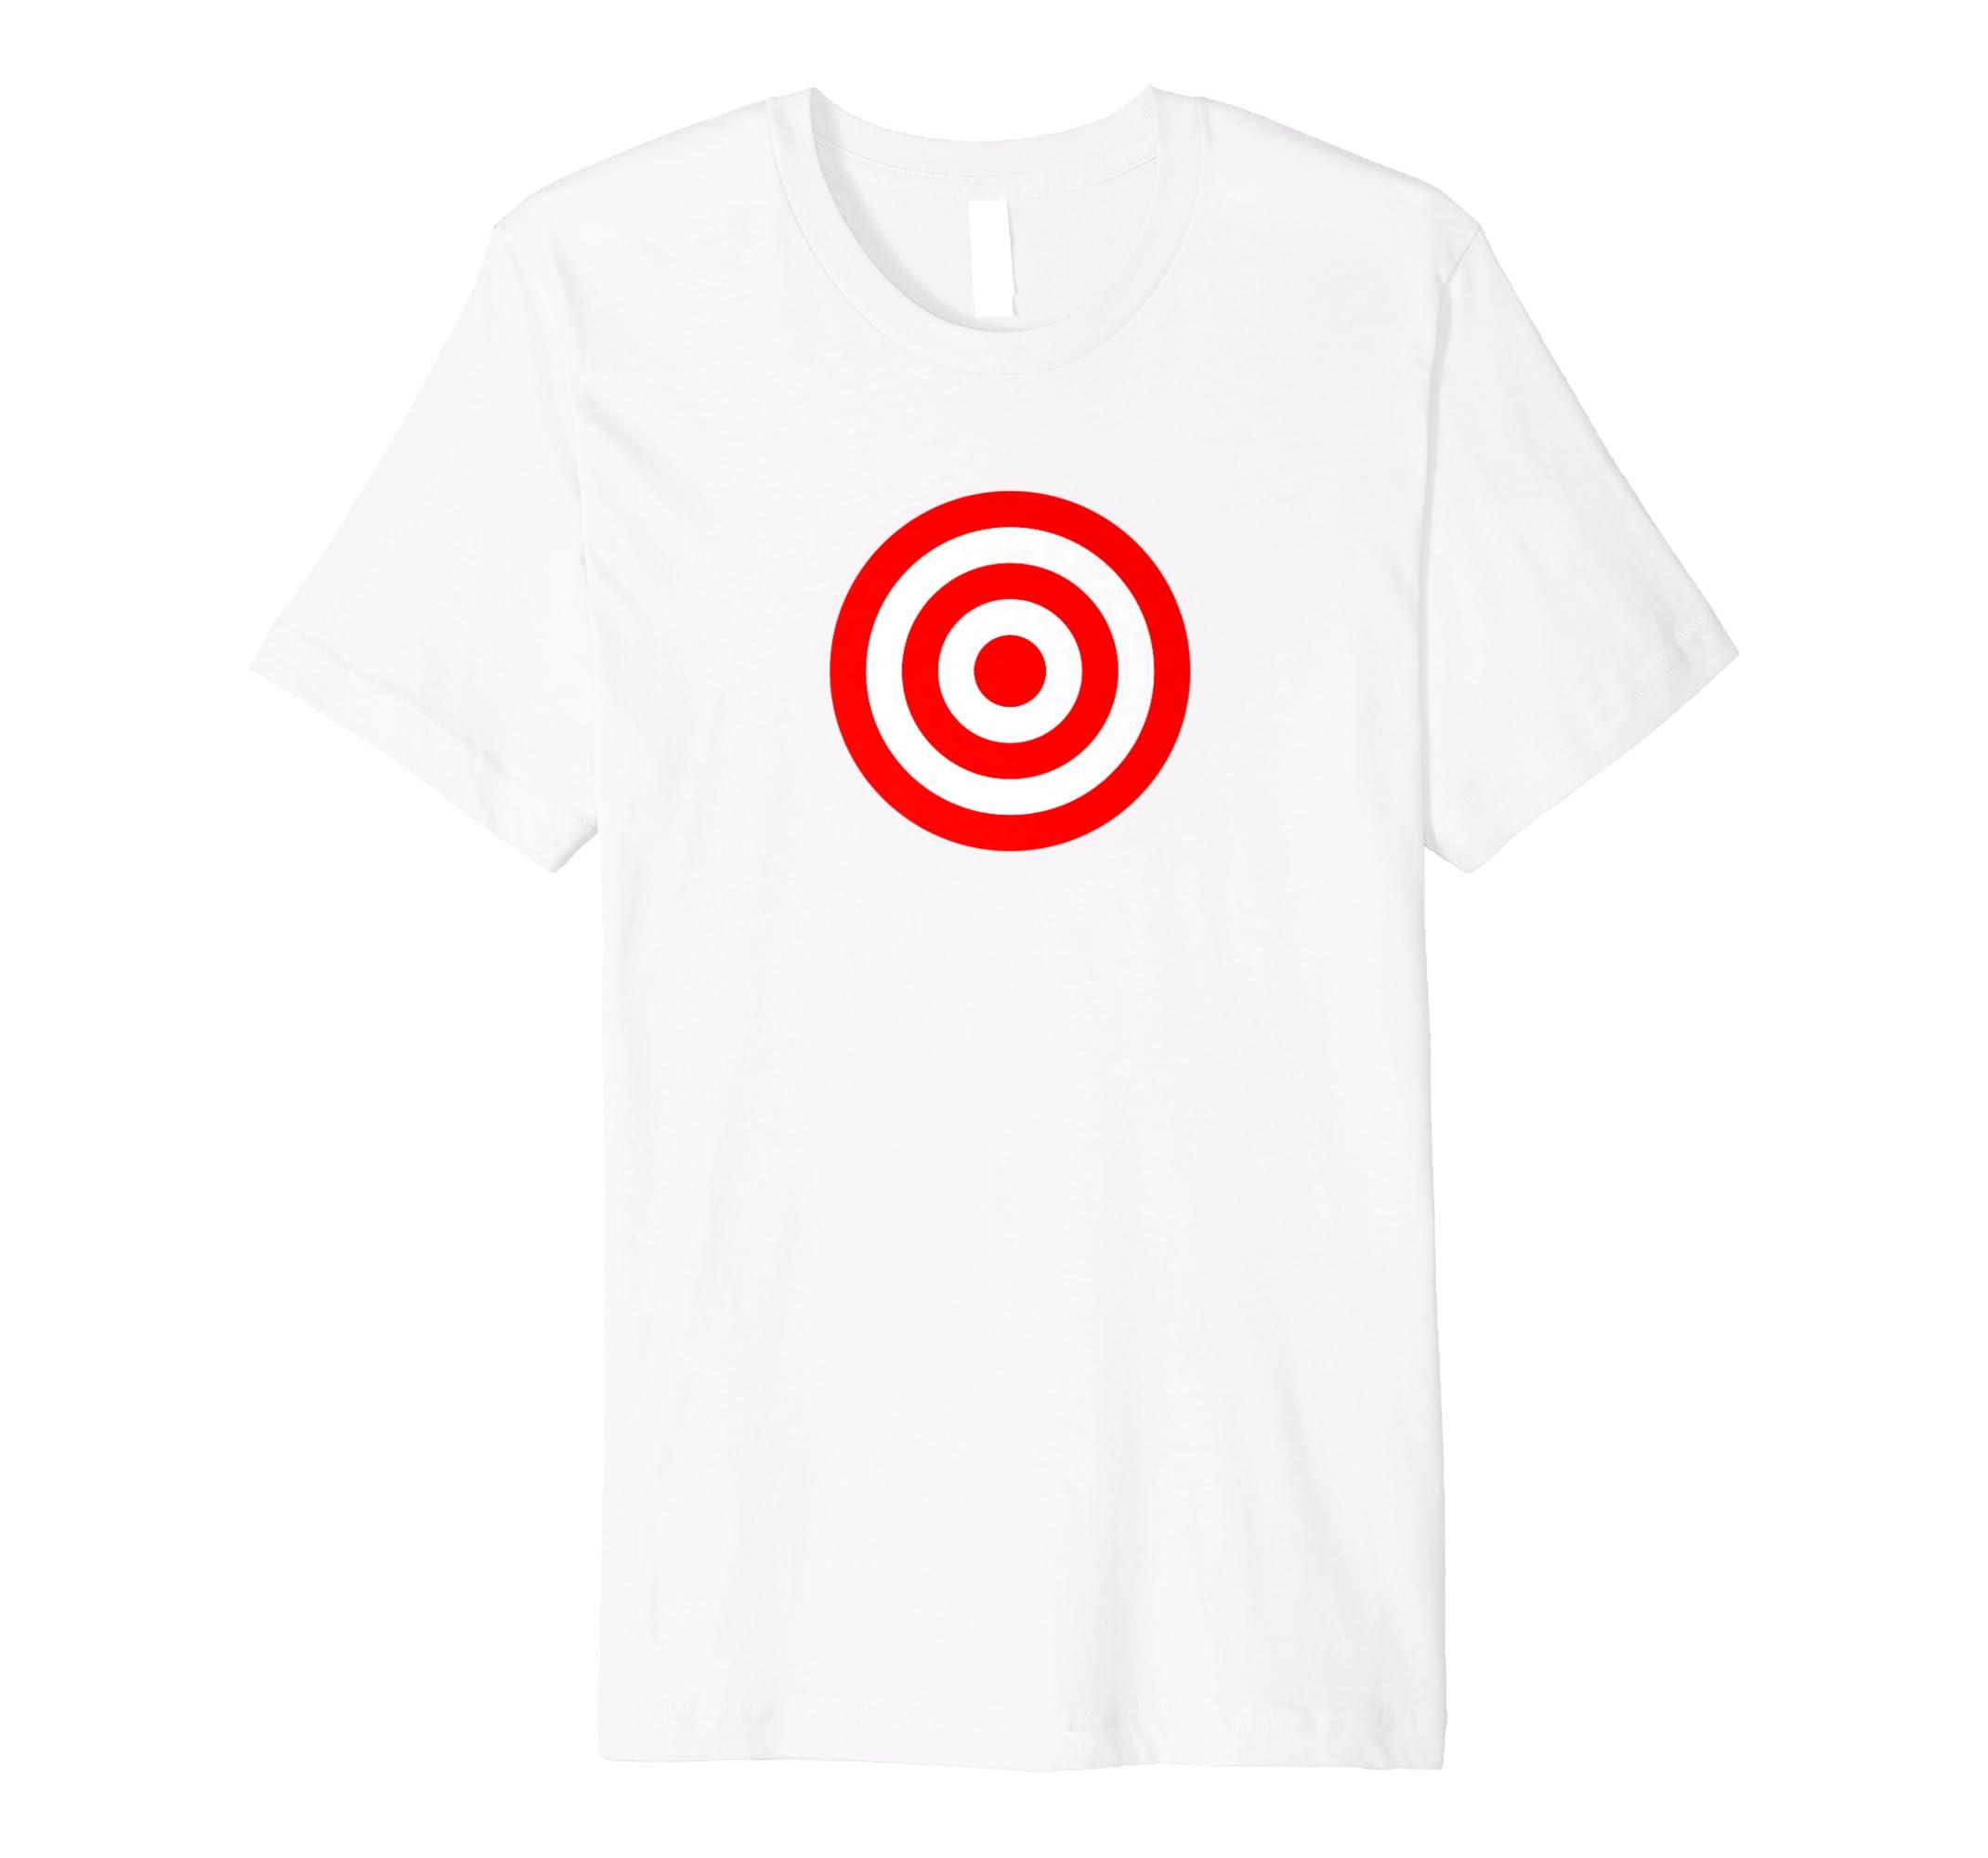 fa6f6672 Amazon.com: Bullseye Red & White Shooting Rings Target Funny Tee Shirt:  Clothing